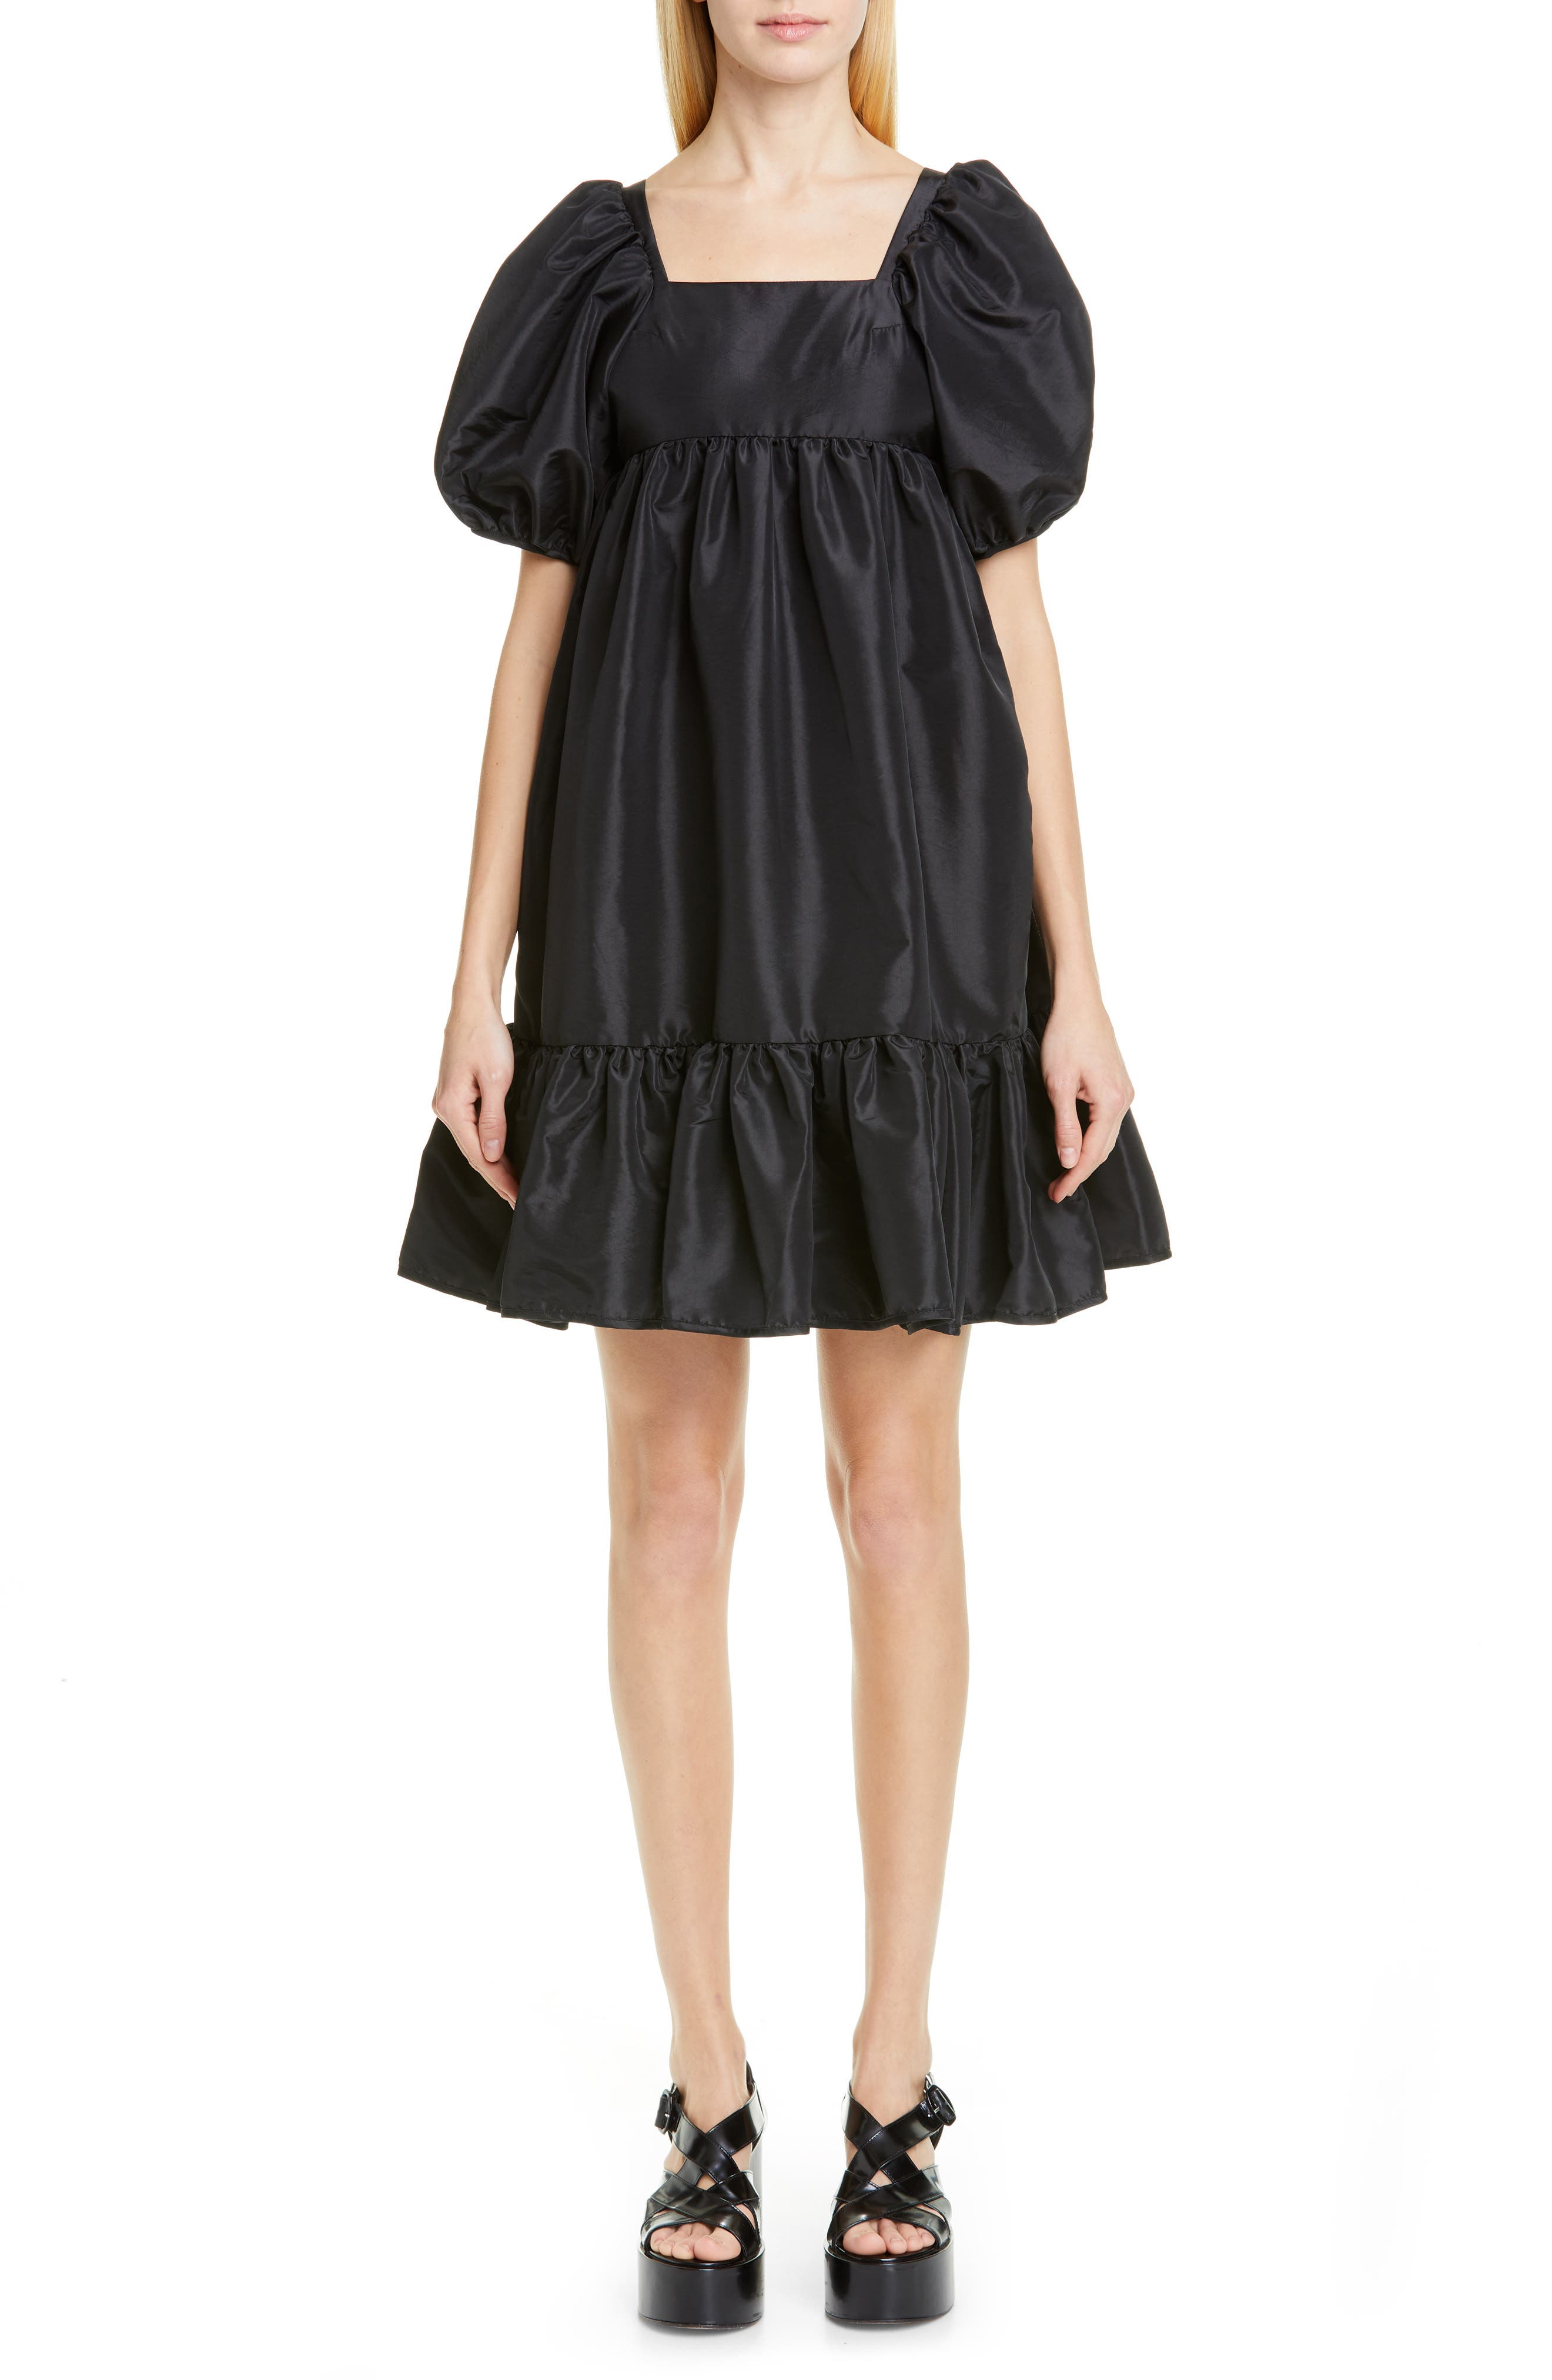 Cecilie Bahnsen Renee Dress, US / 8 UK - Black